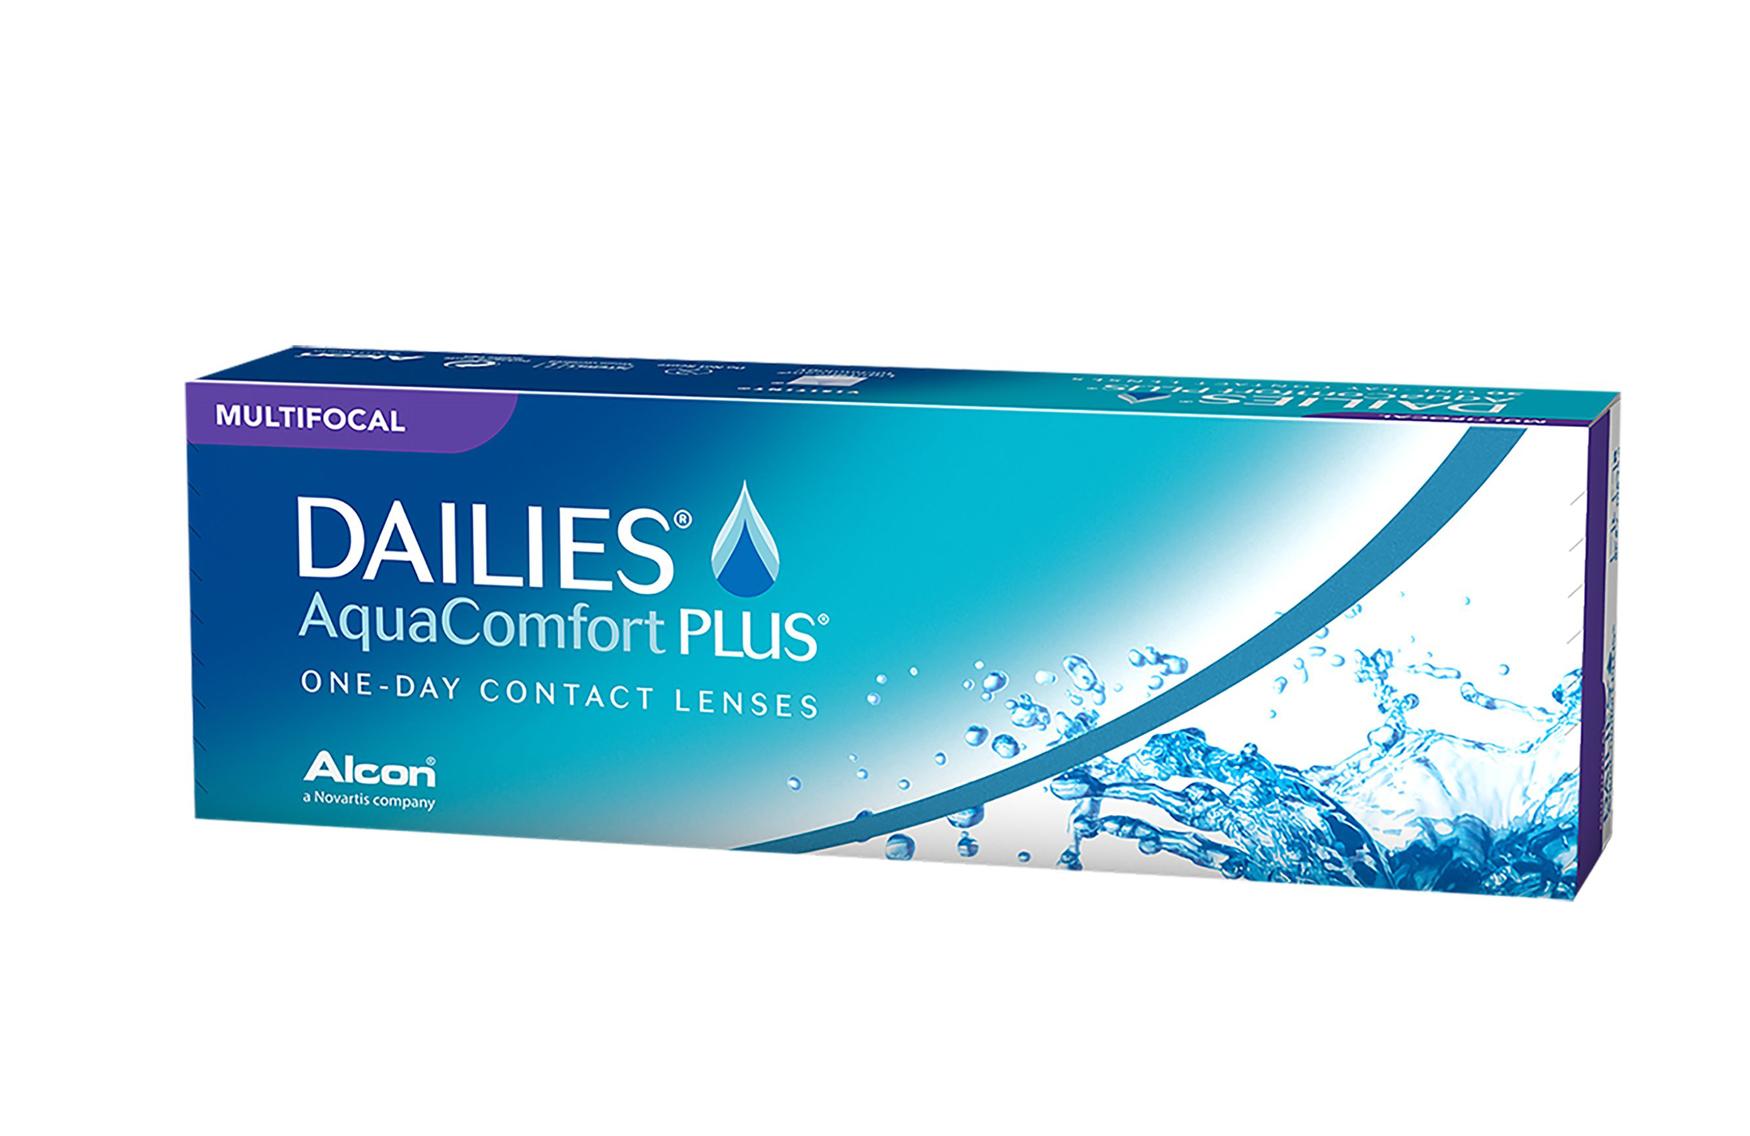 Dailies Aquacomfort Plus Multifocal (30 Lenti)